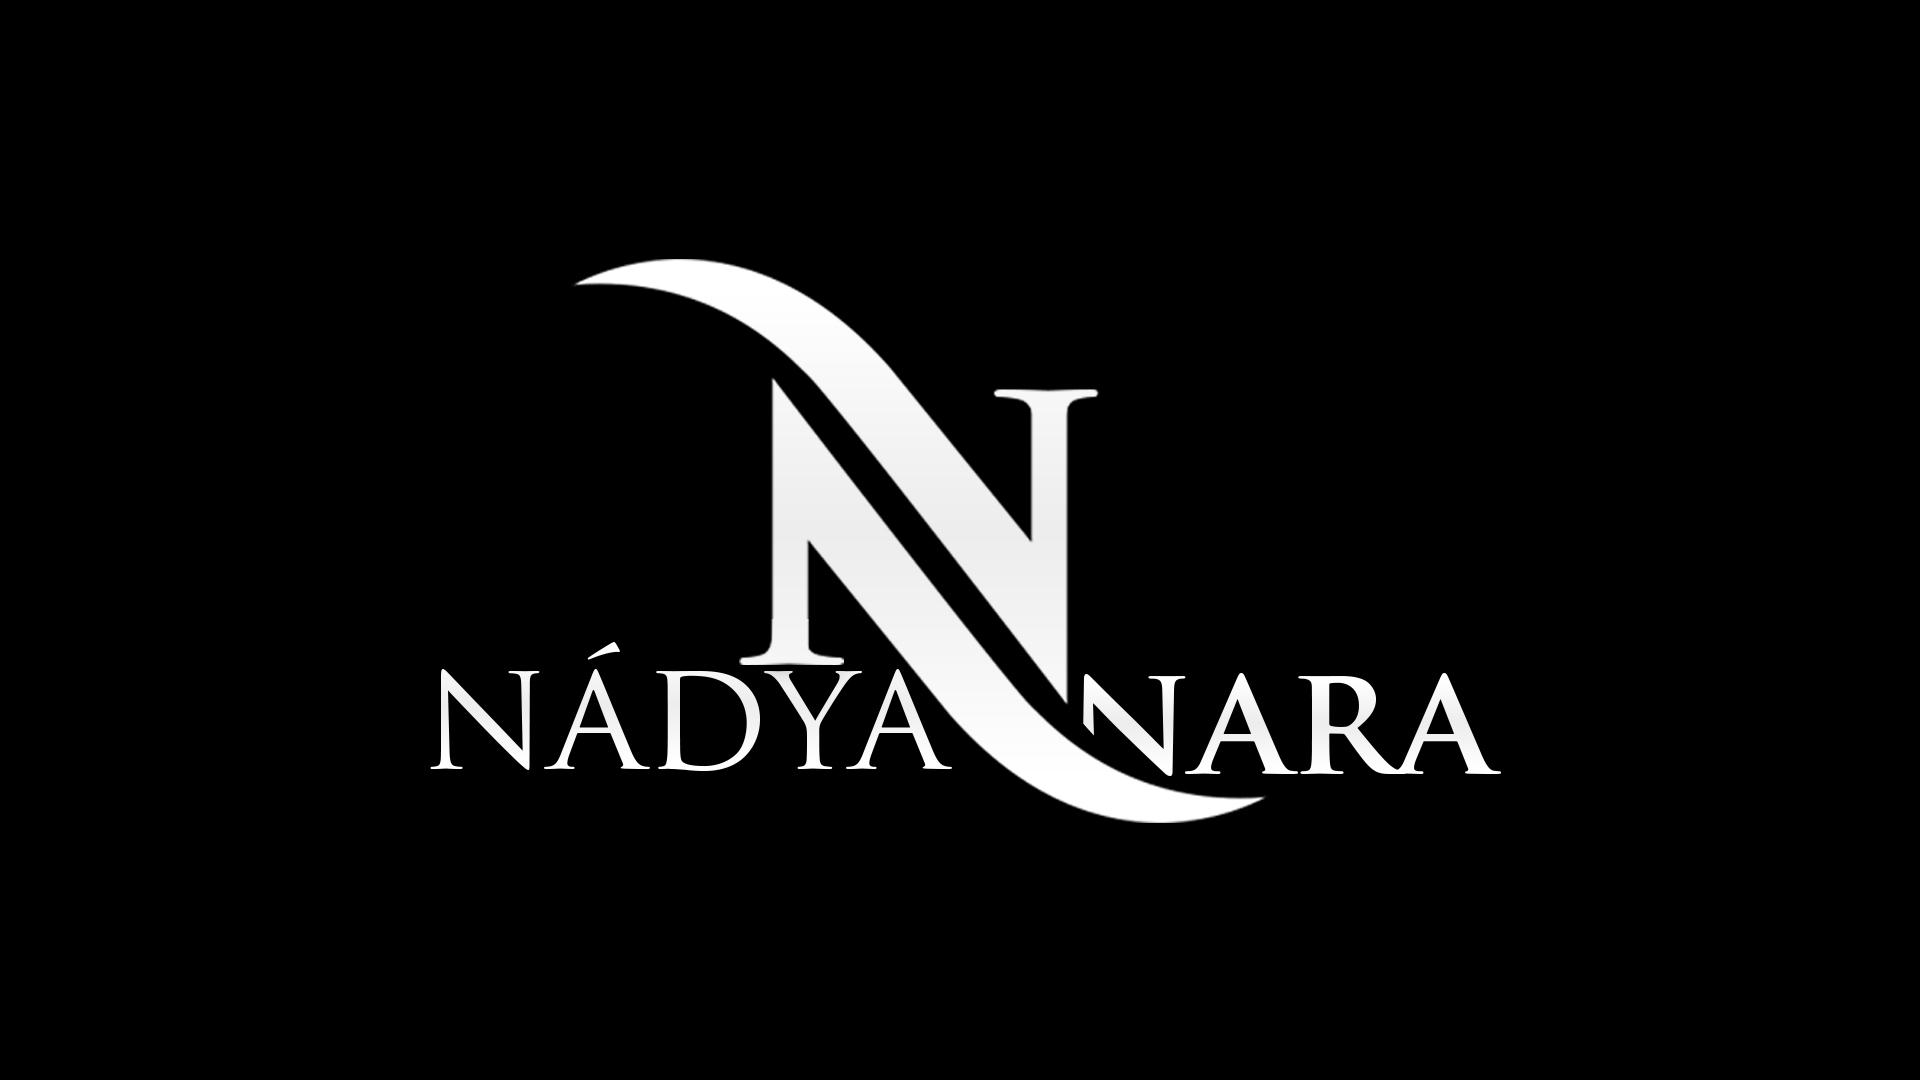 Nadya Nara